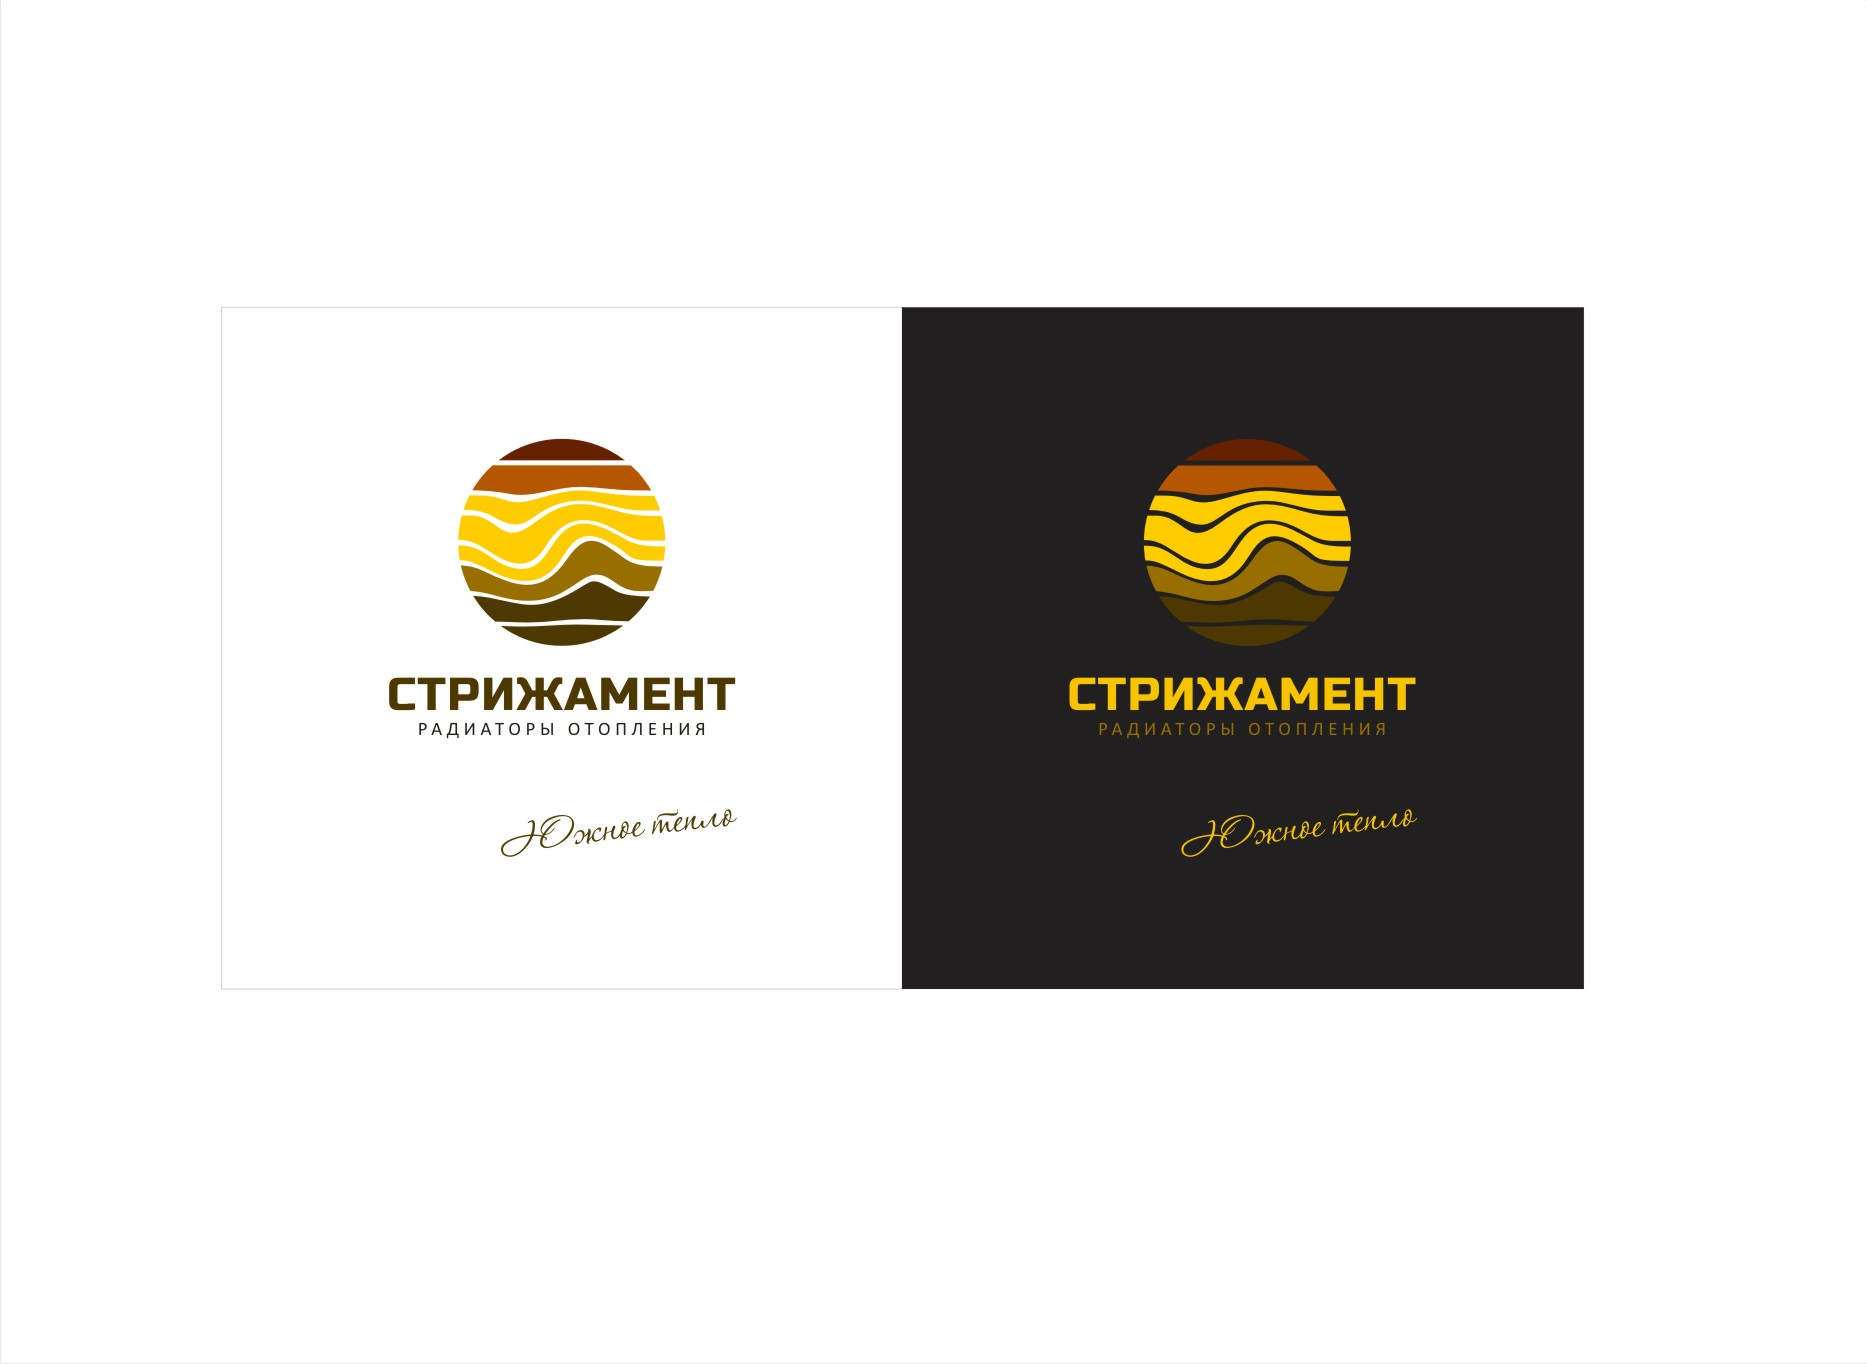 Дизайн лого бренда фото f_6205d4dc24e953de.jpg